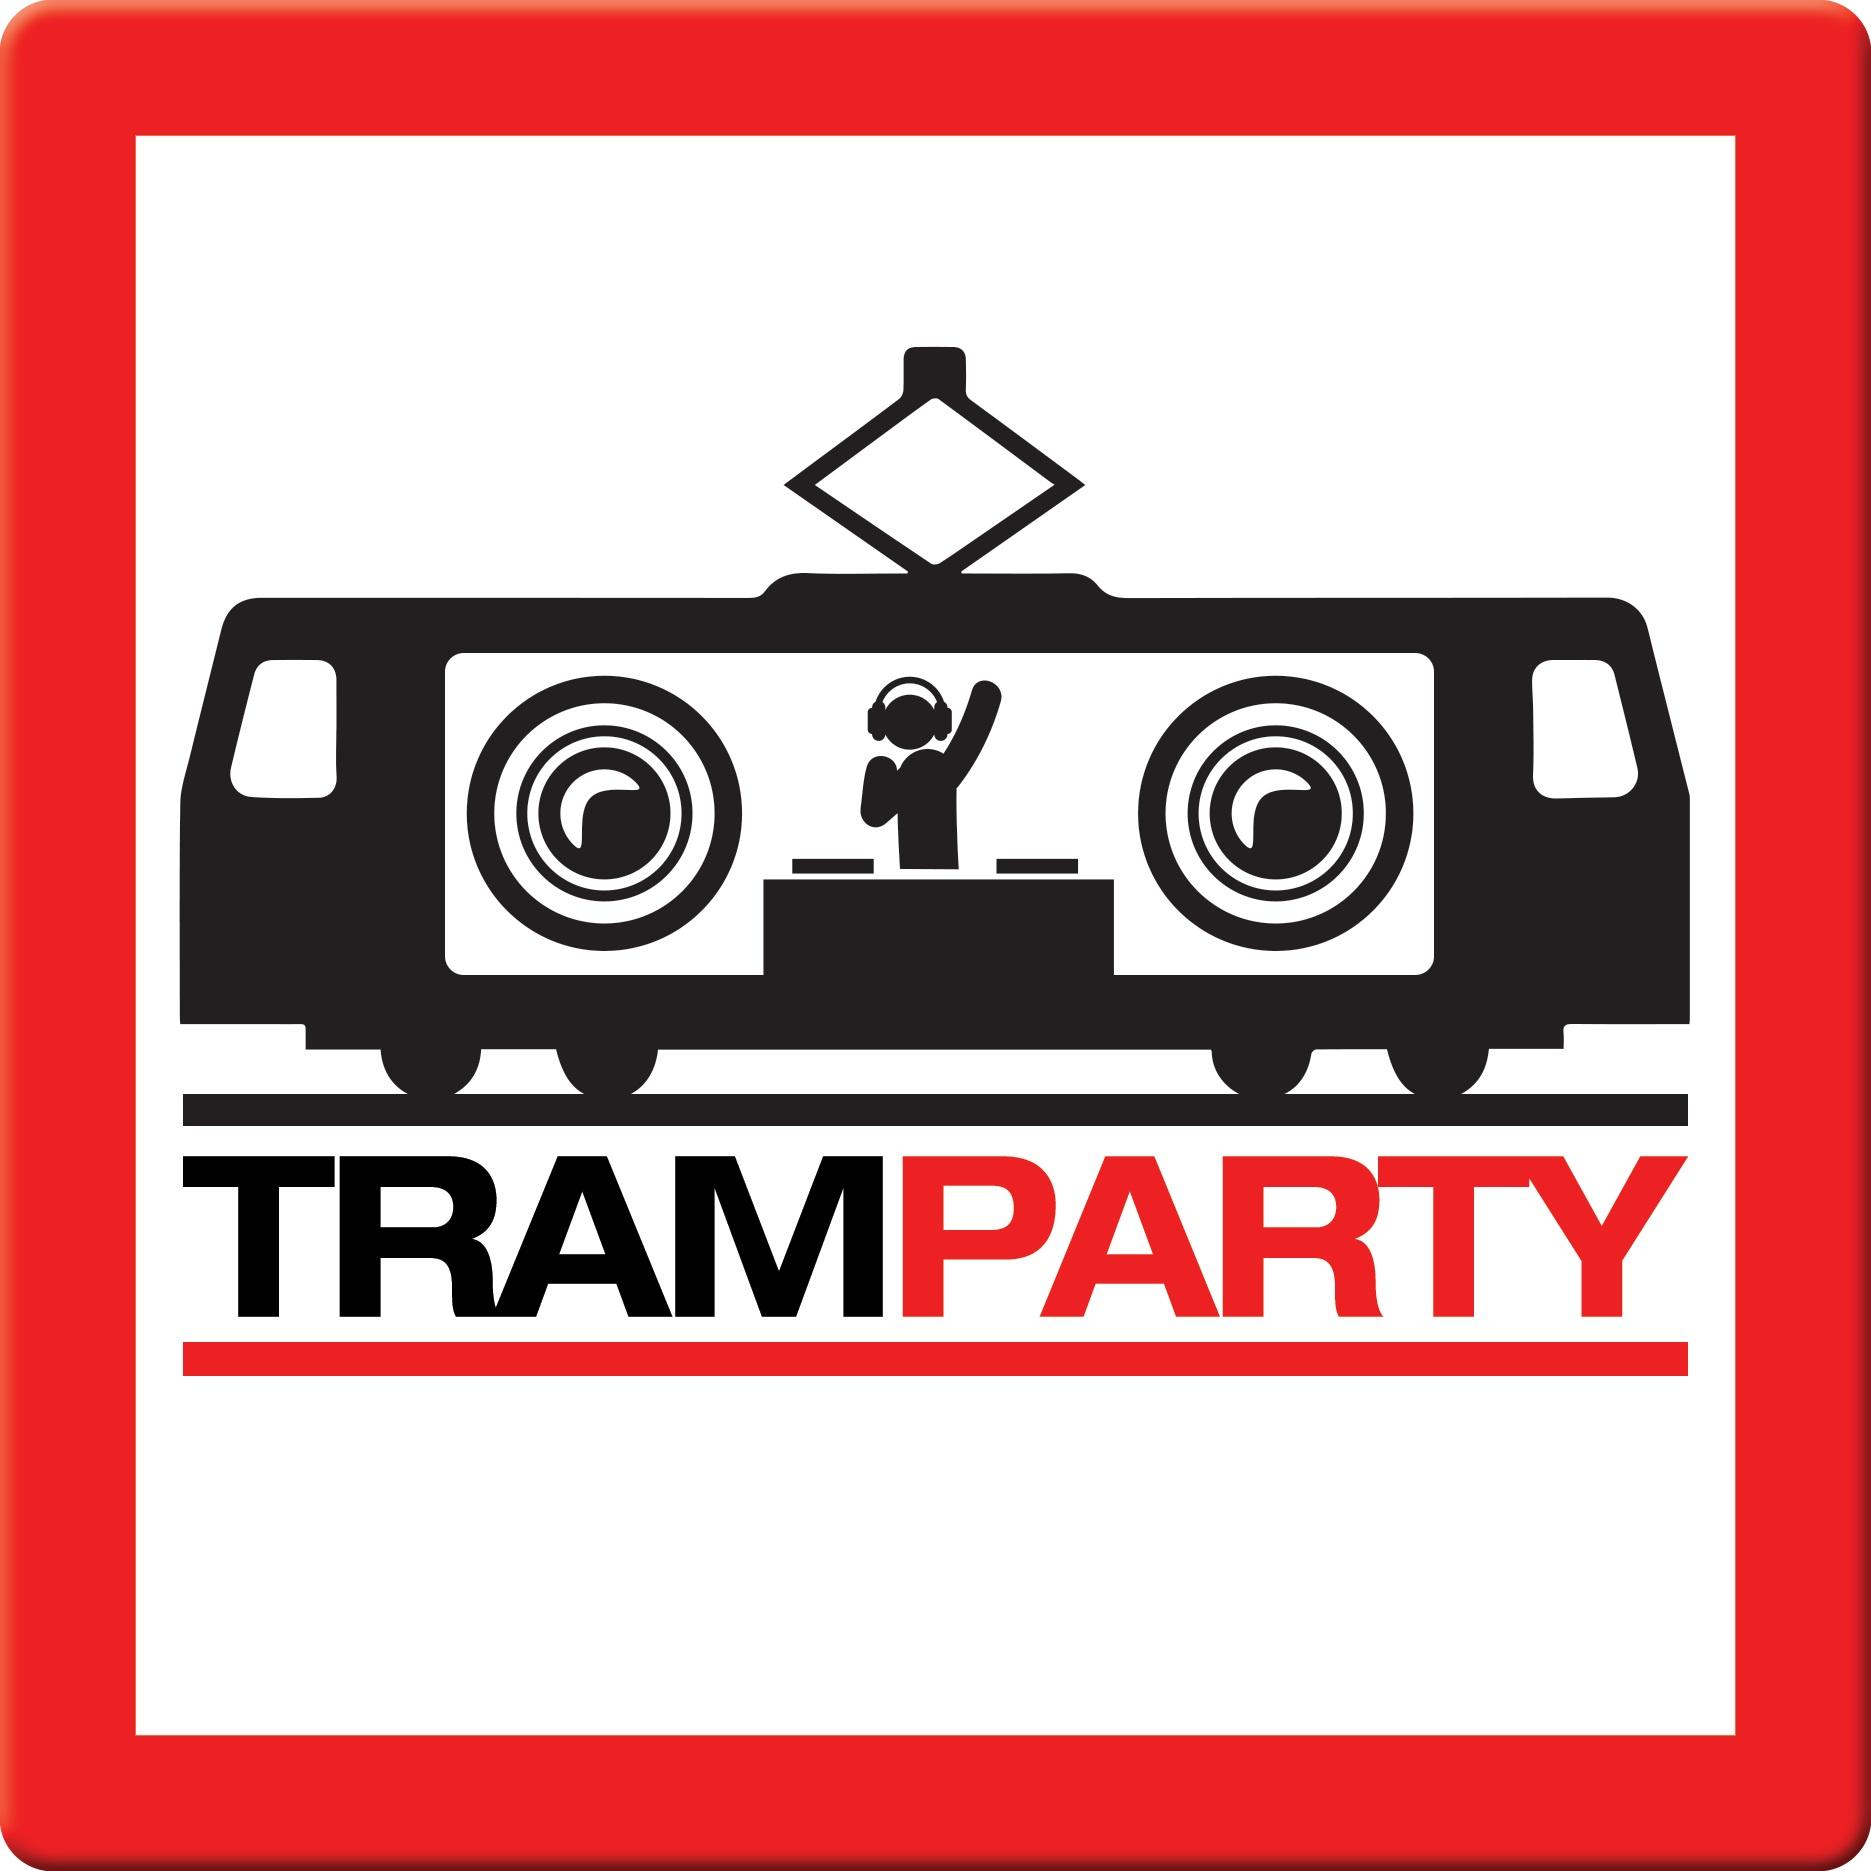 Tram Party Warszawa